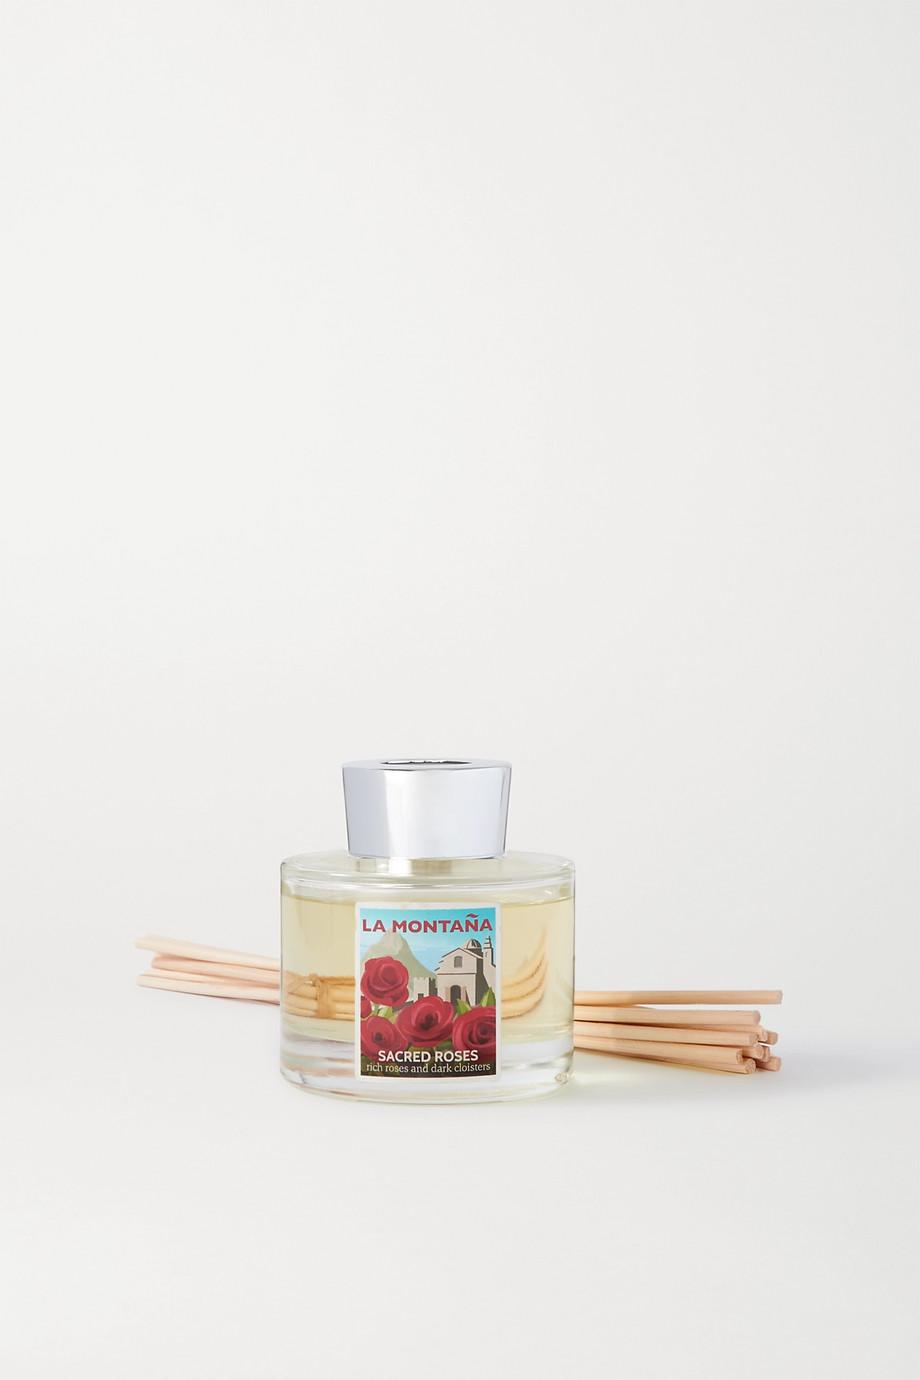 La Montaña Reed Diffuser - Sacred Roses, 120ml